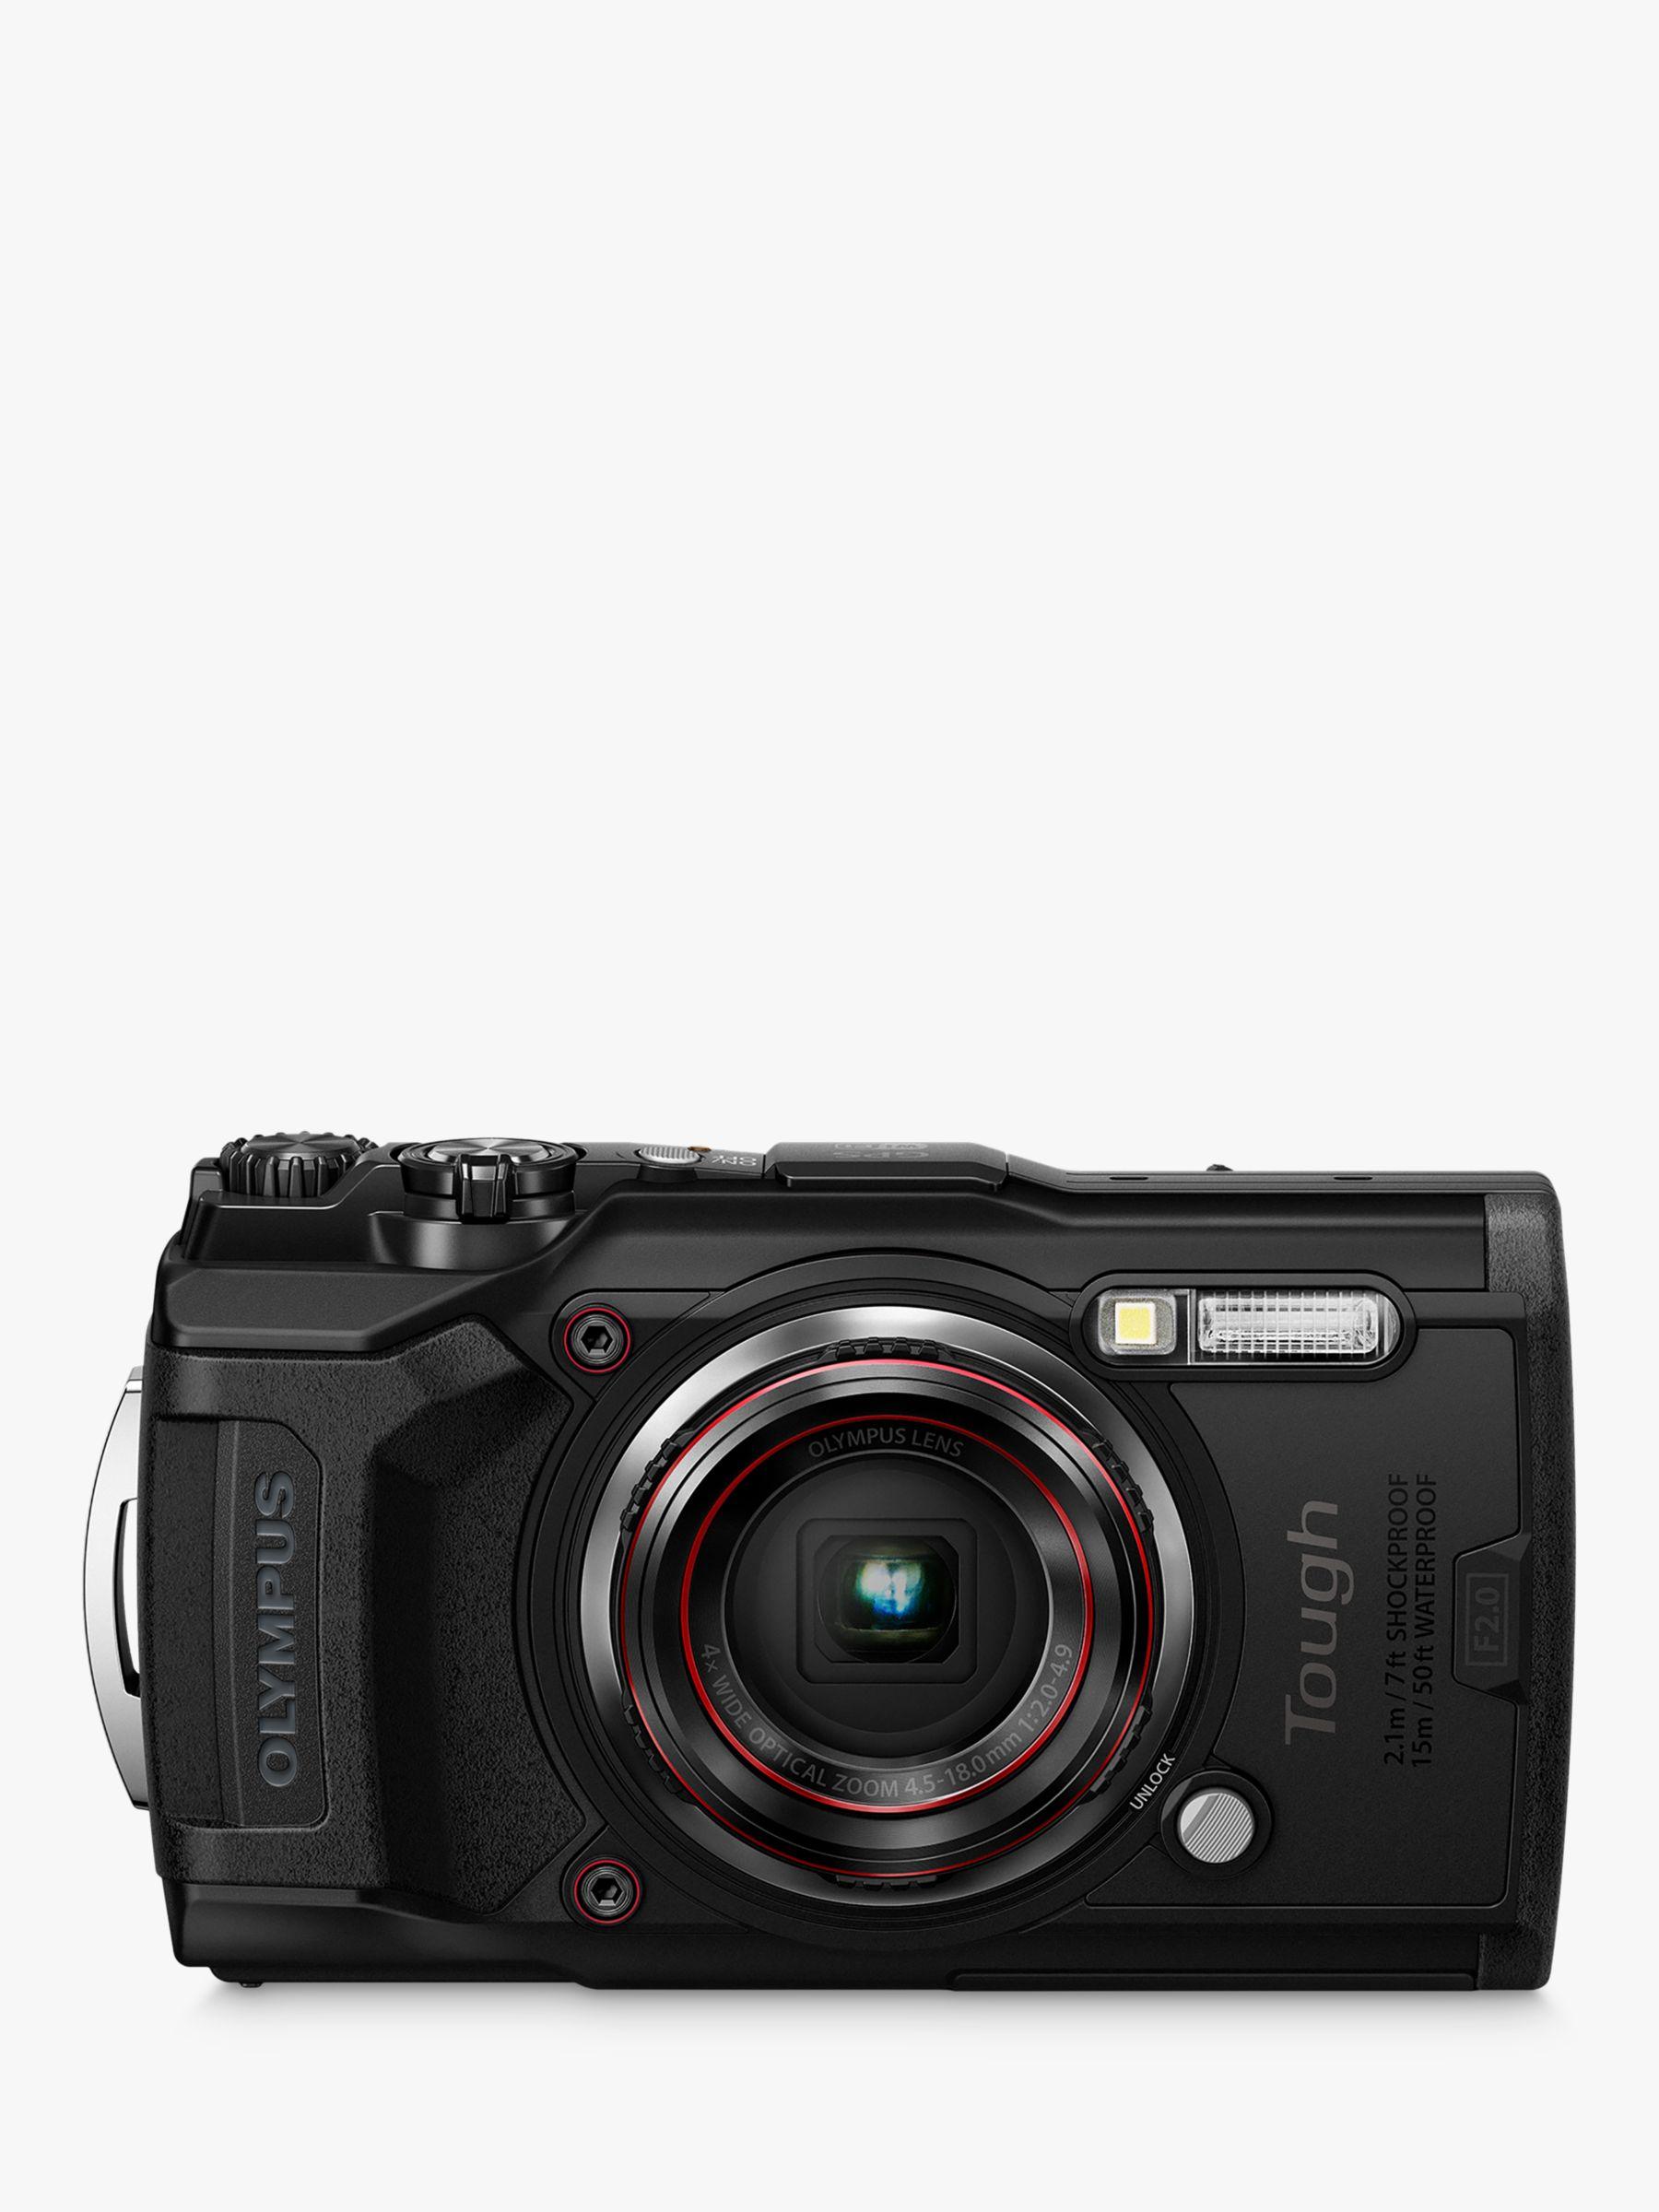 Olympus Olympus Tough TG-6 GPS Waterproof, Freezeproof, Shockproof, Dustproof Compact Digital Camera, 12MP, 4K UHD, 4x Optical Zoom, Wi-Fi, RAW Shooting, 3 LCD Screen